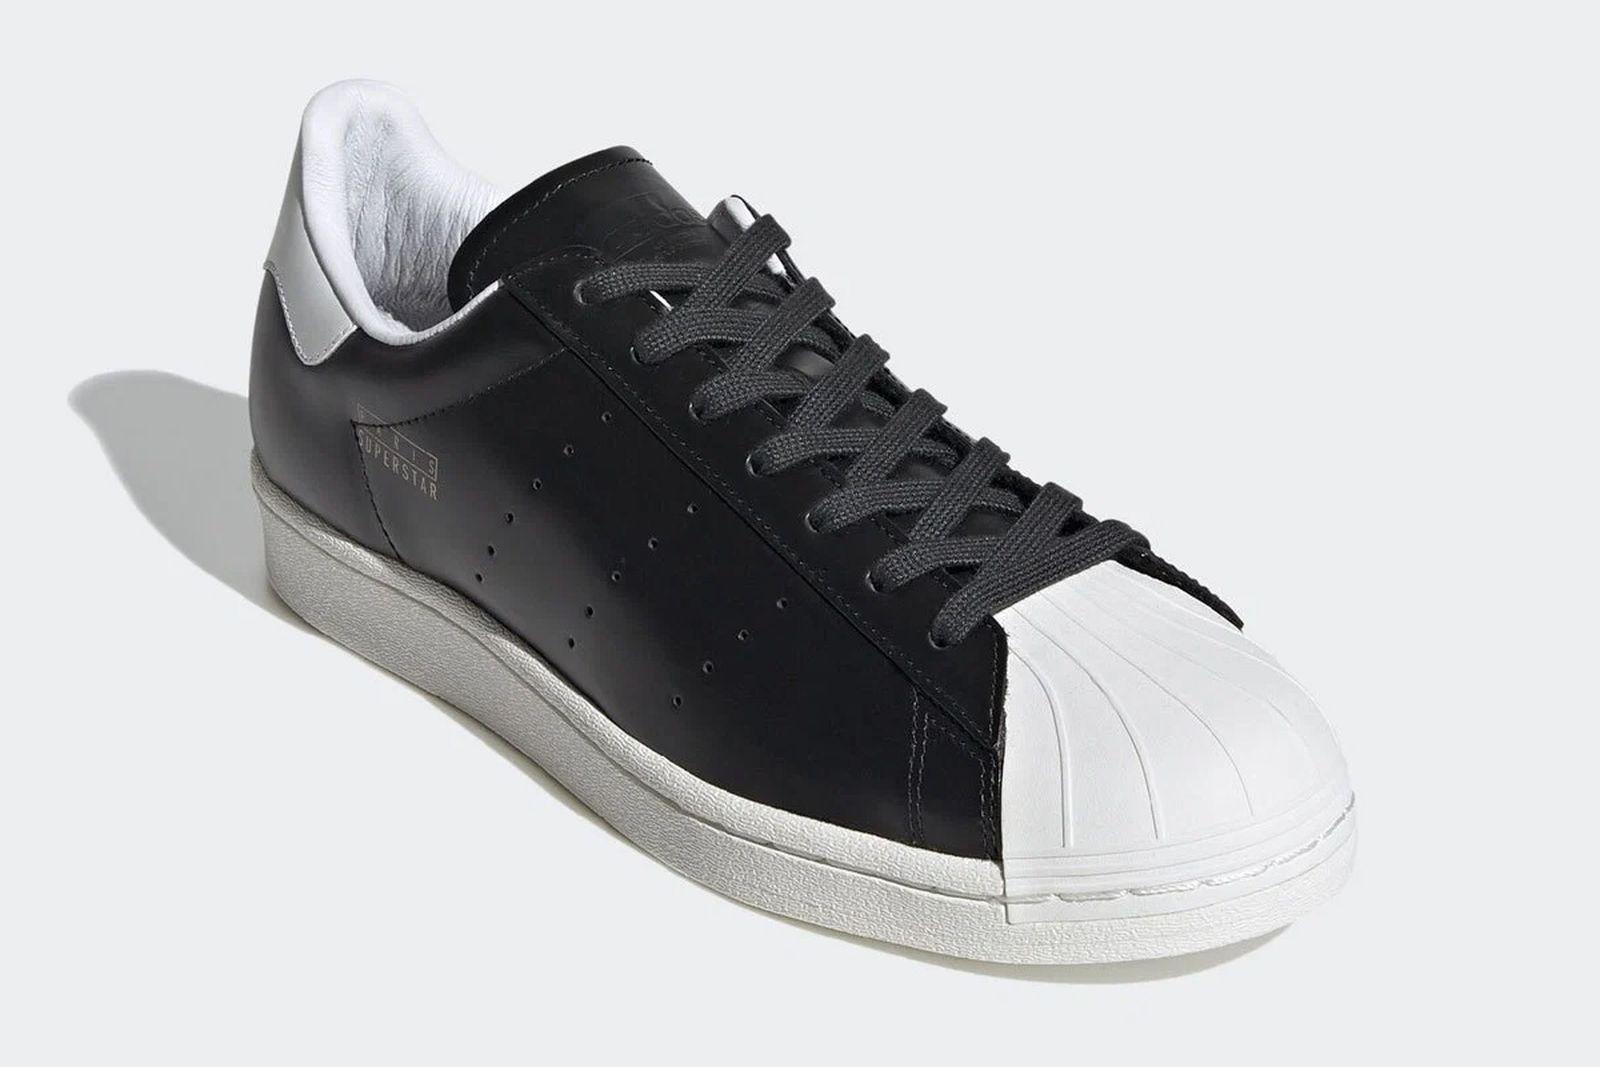 adidas-superstar-pure-paris-release-date-price-03